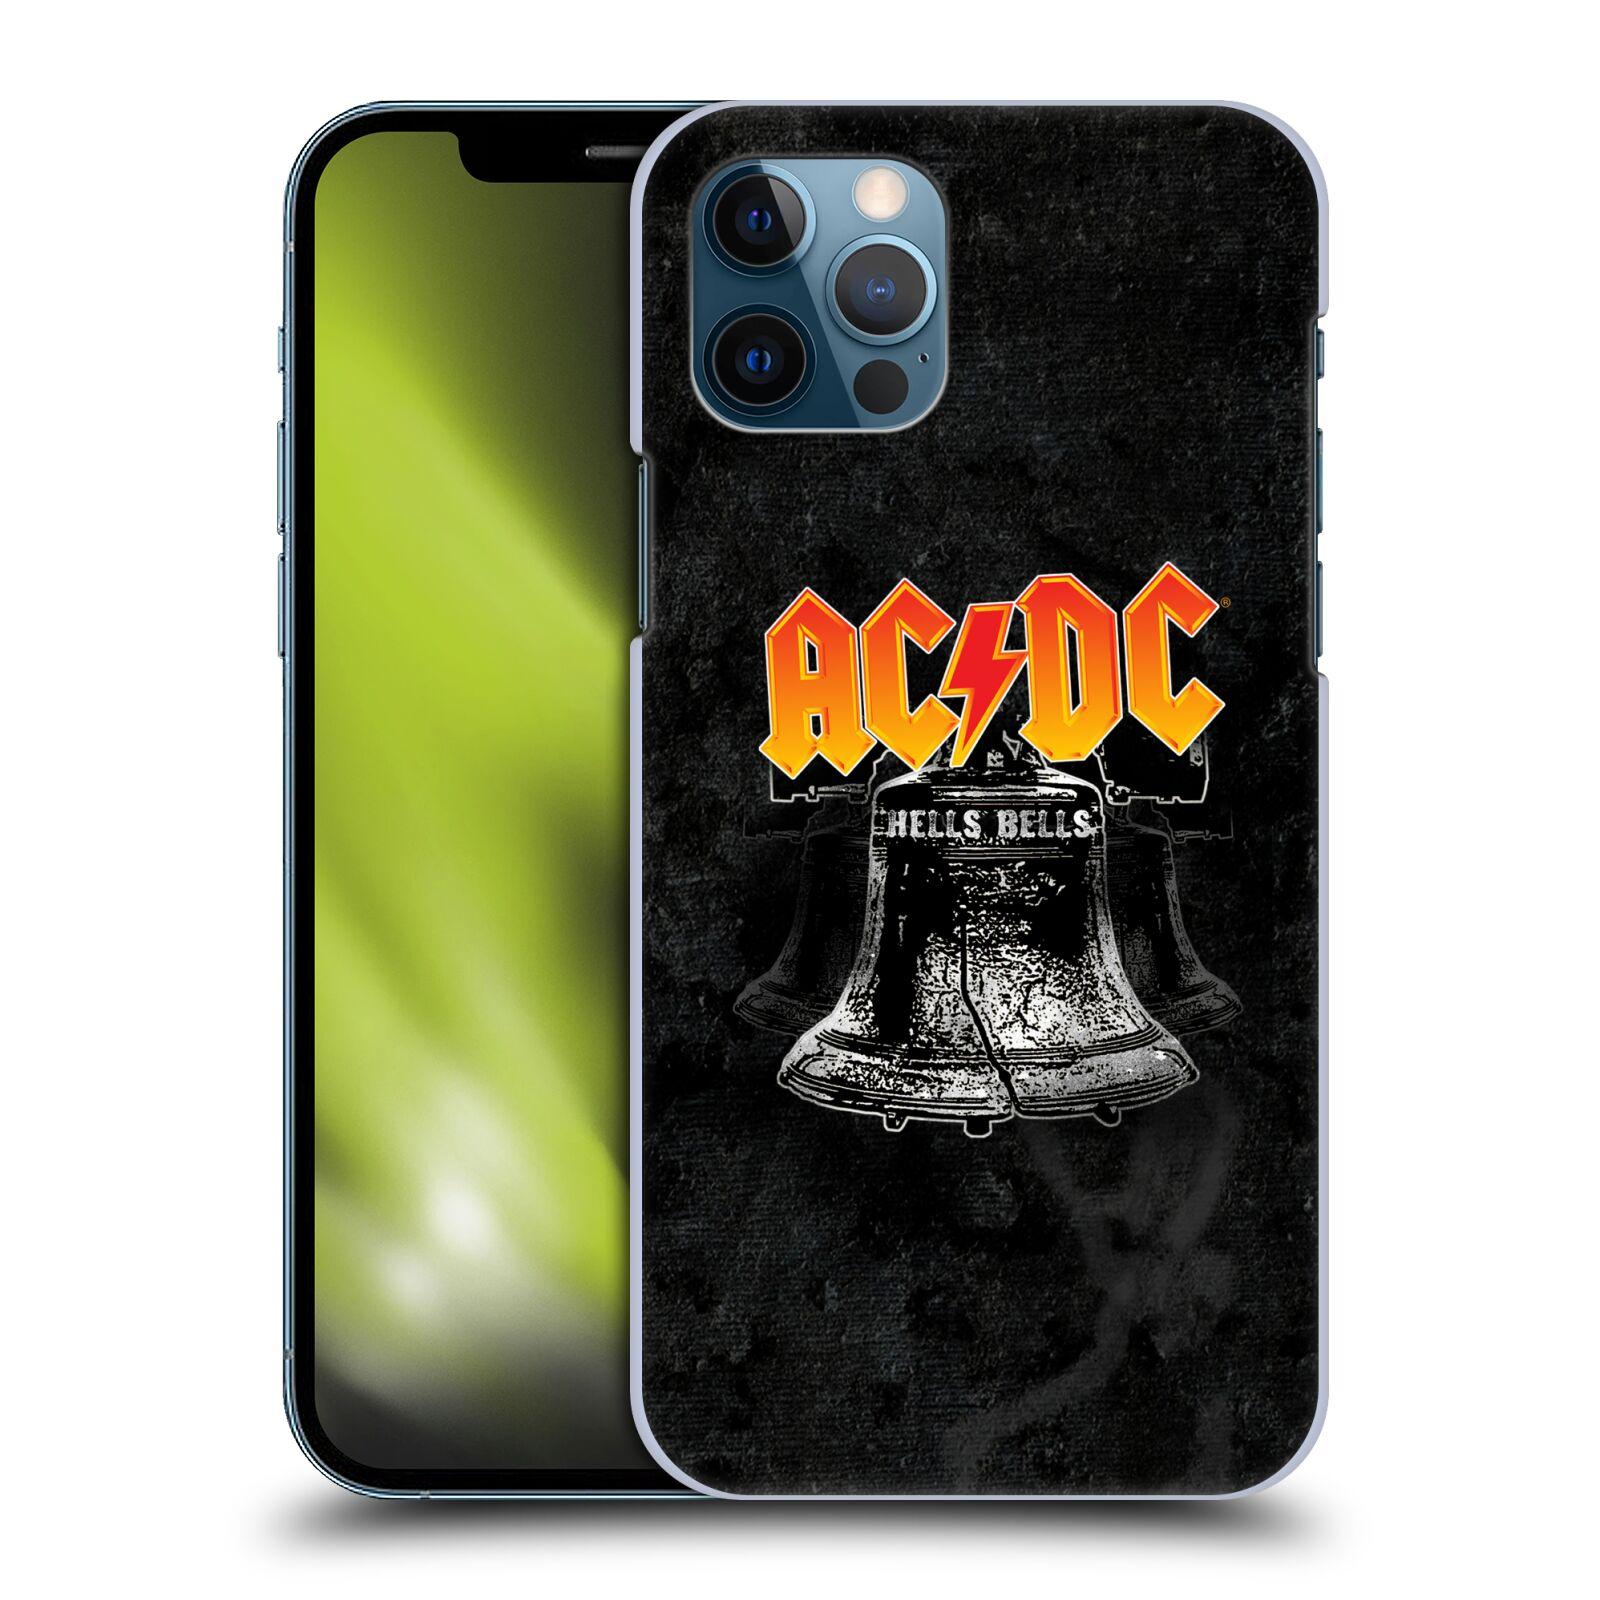 Plastové pouzdro na mobil Apple iPhone 12 / 12 Pro - Head Case - AC/DC Hells Bells